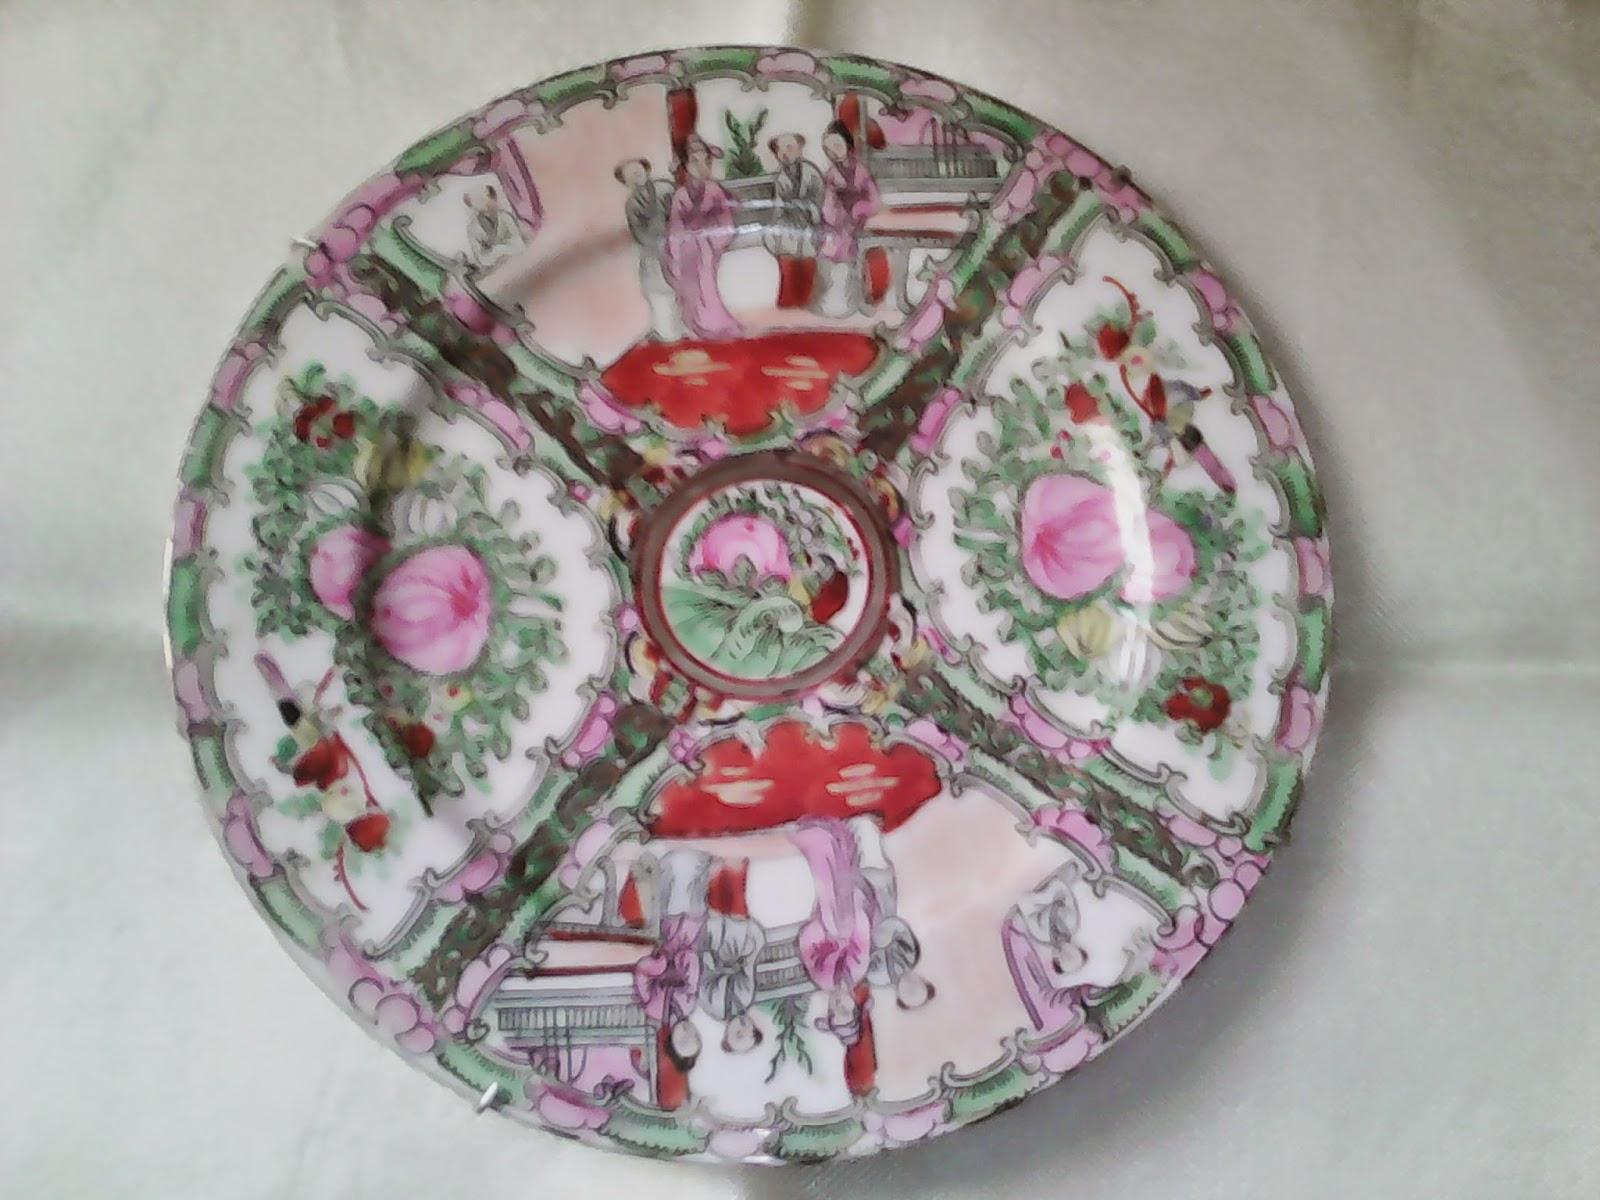 O desv n vintage do pereiro platos decorativos - Desvan vintage ...